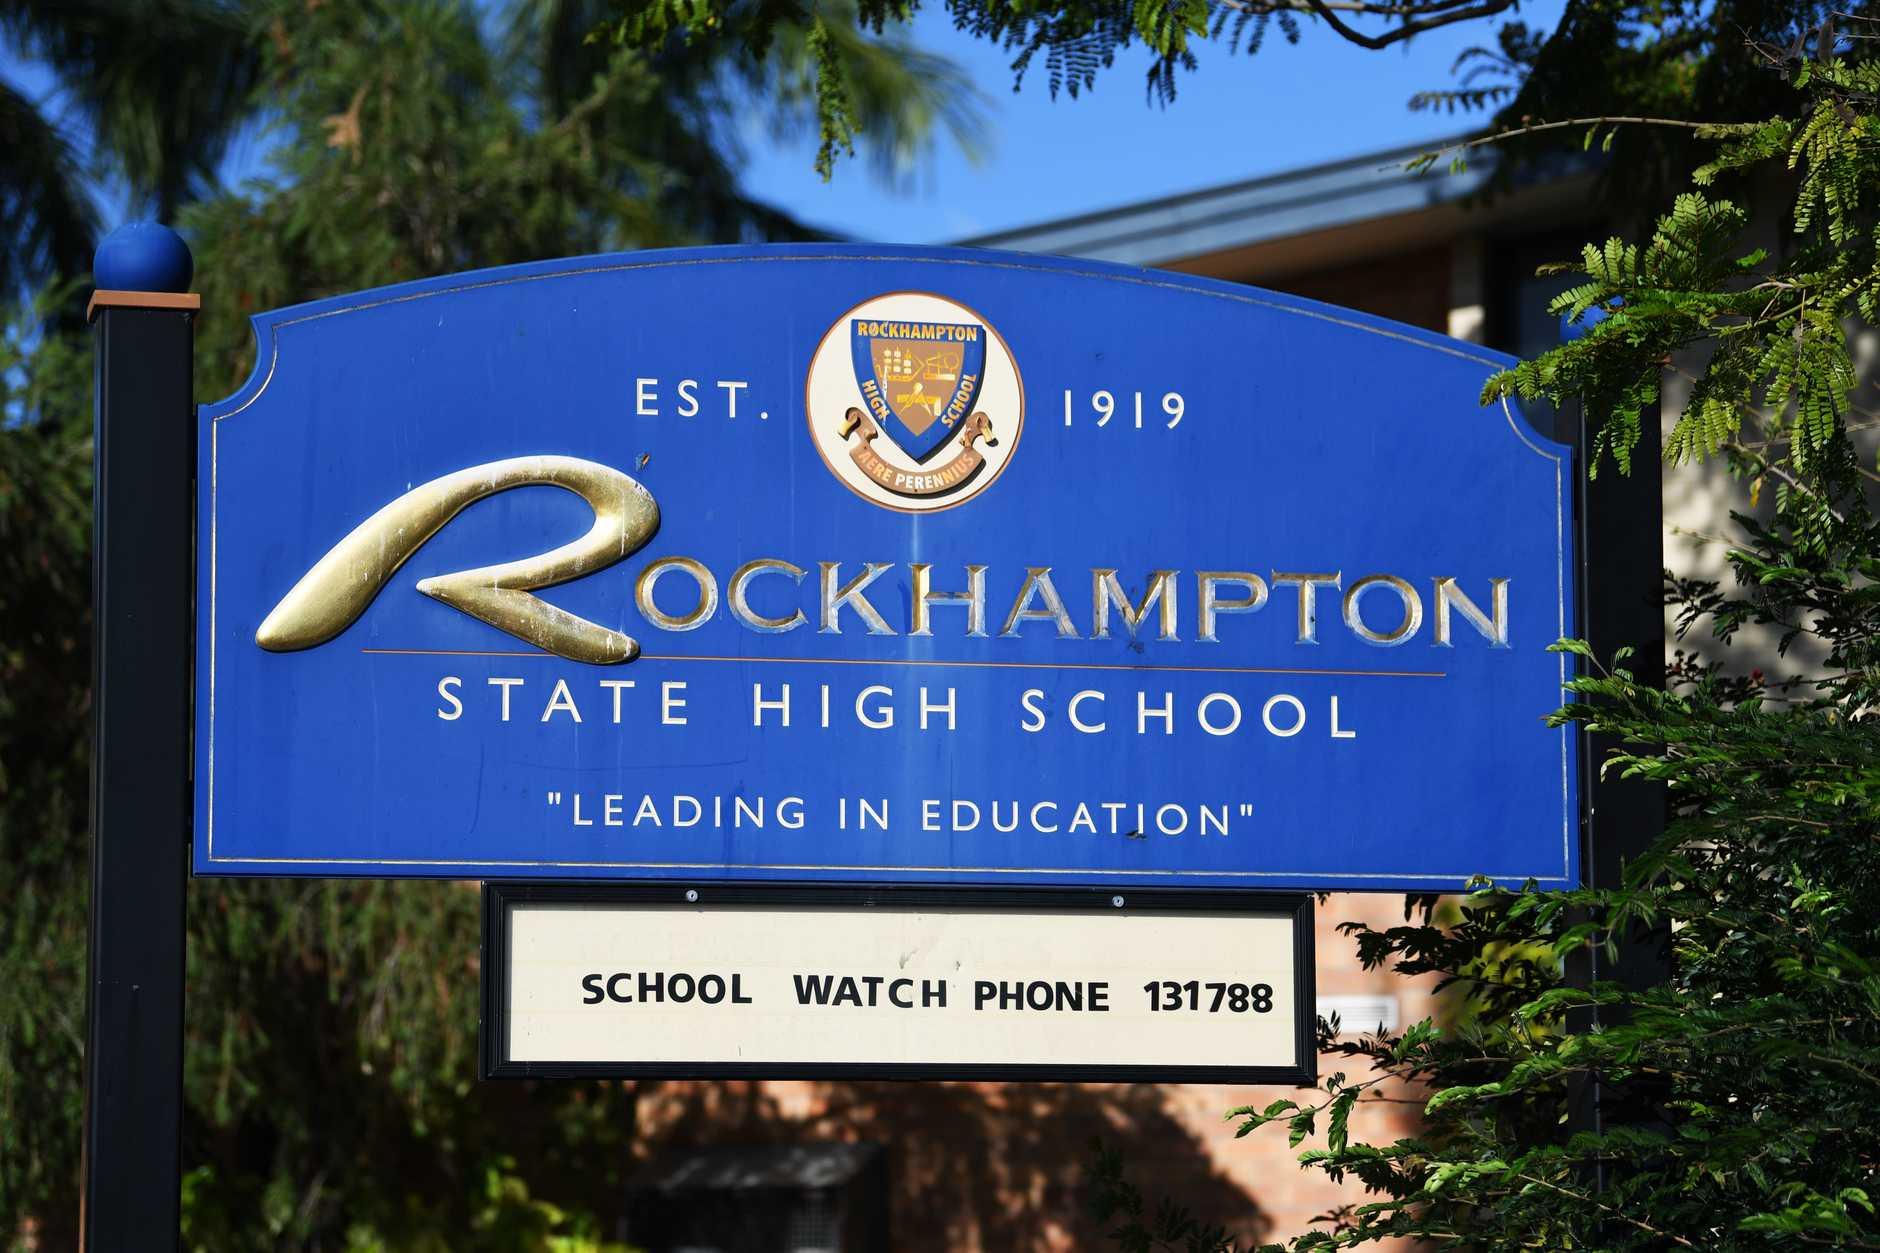 Rockhampton State High School. PHOTO: Allan Reinikka